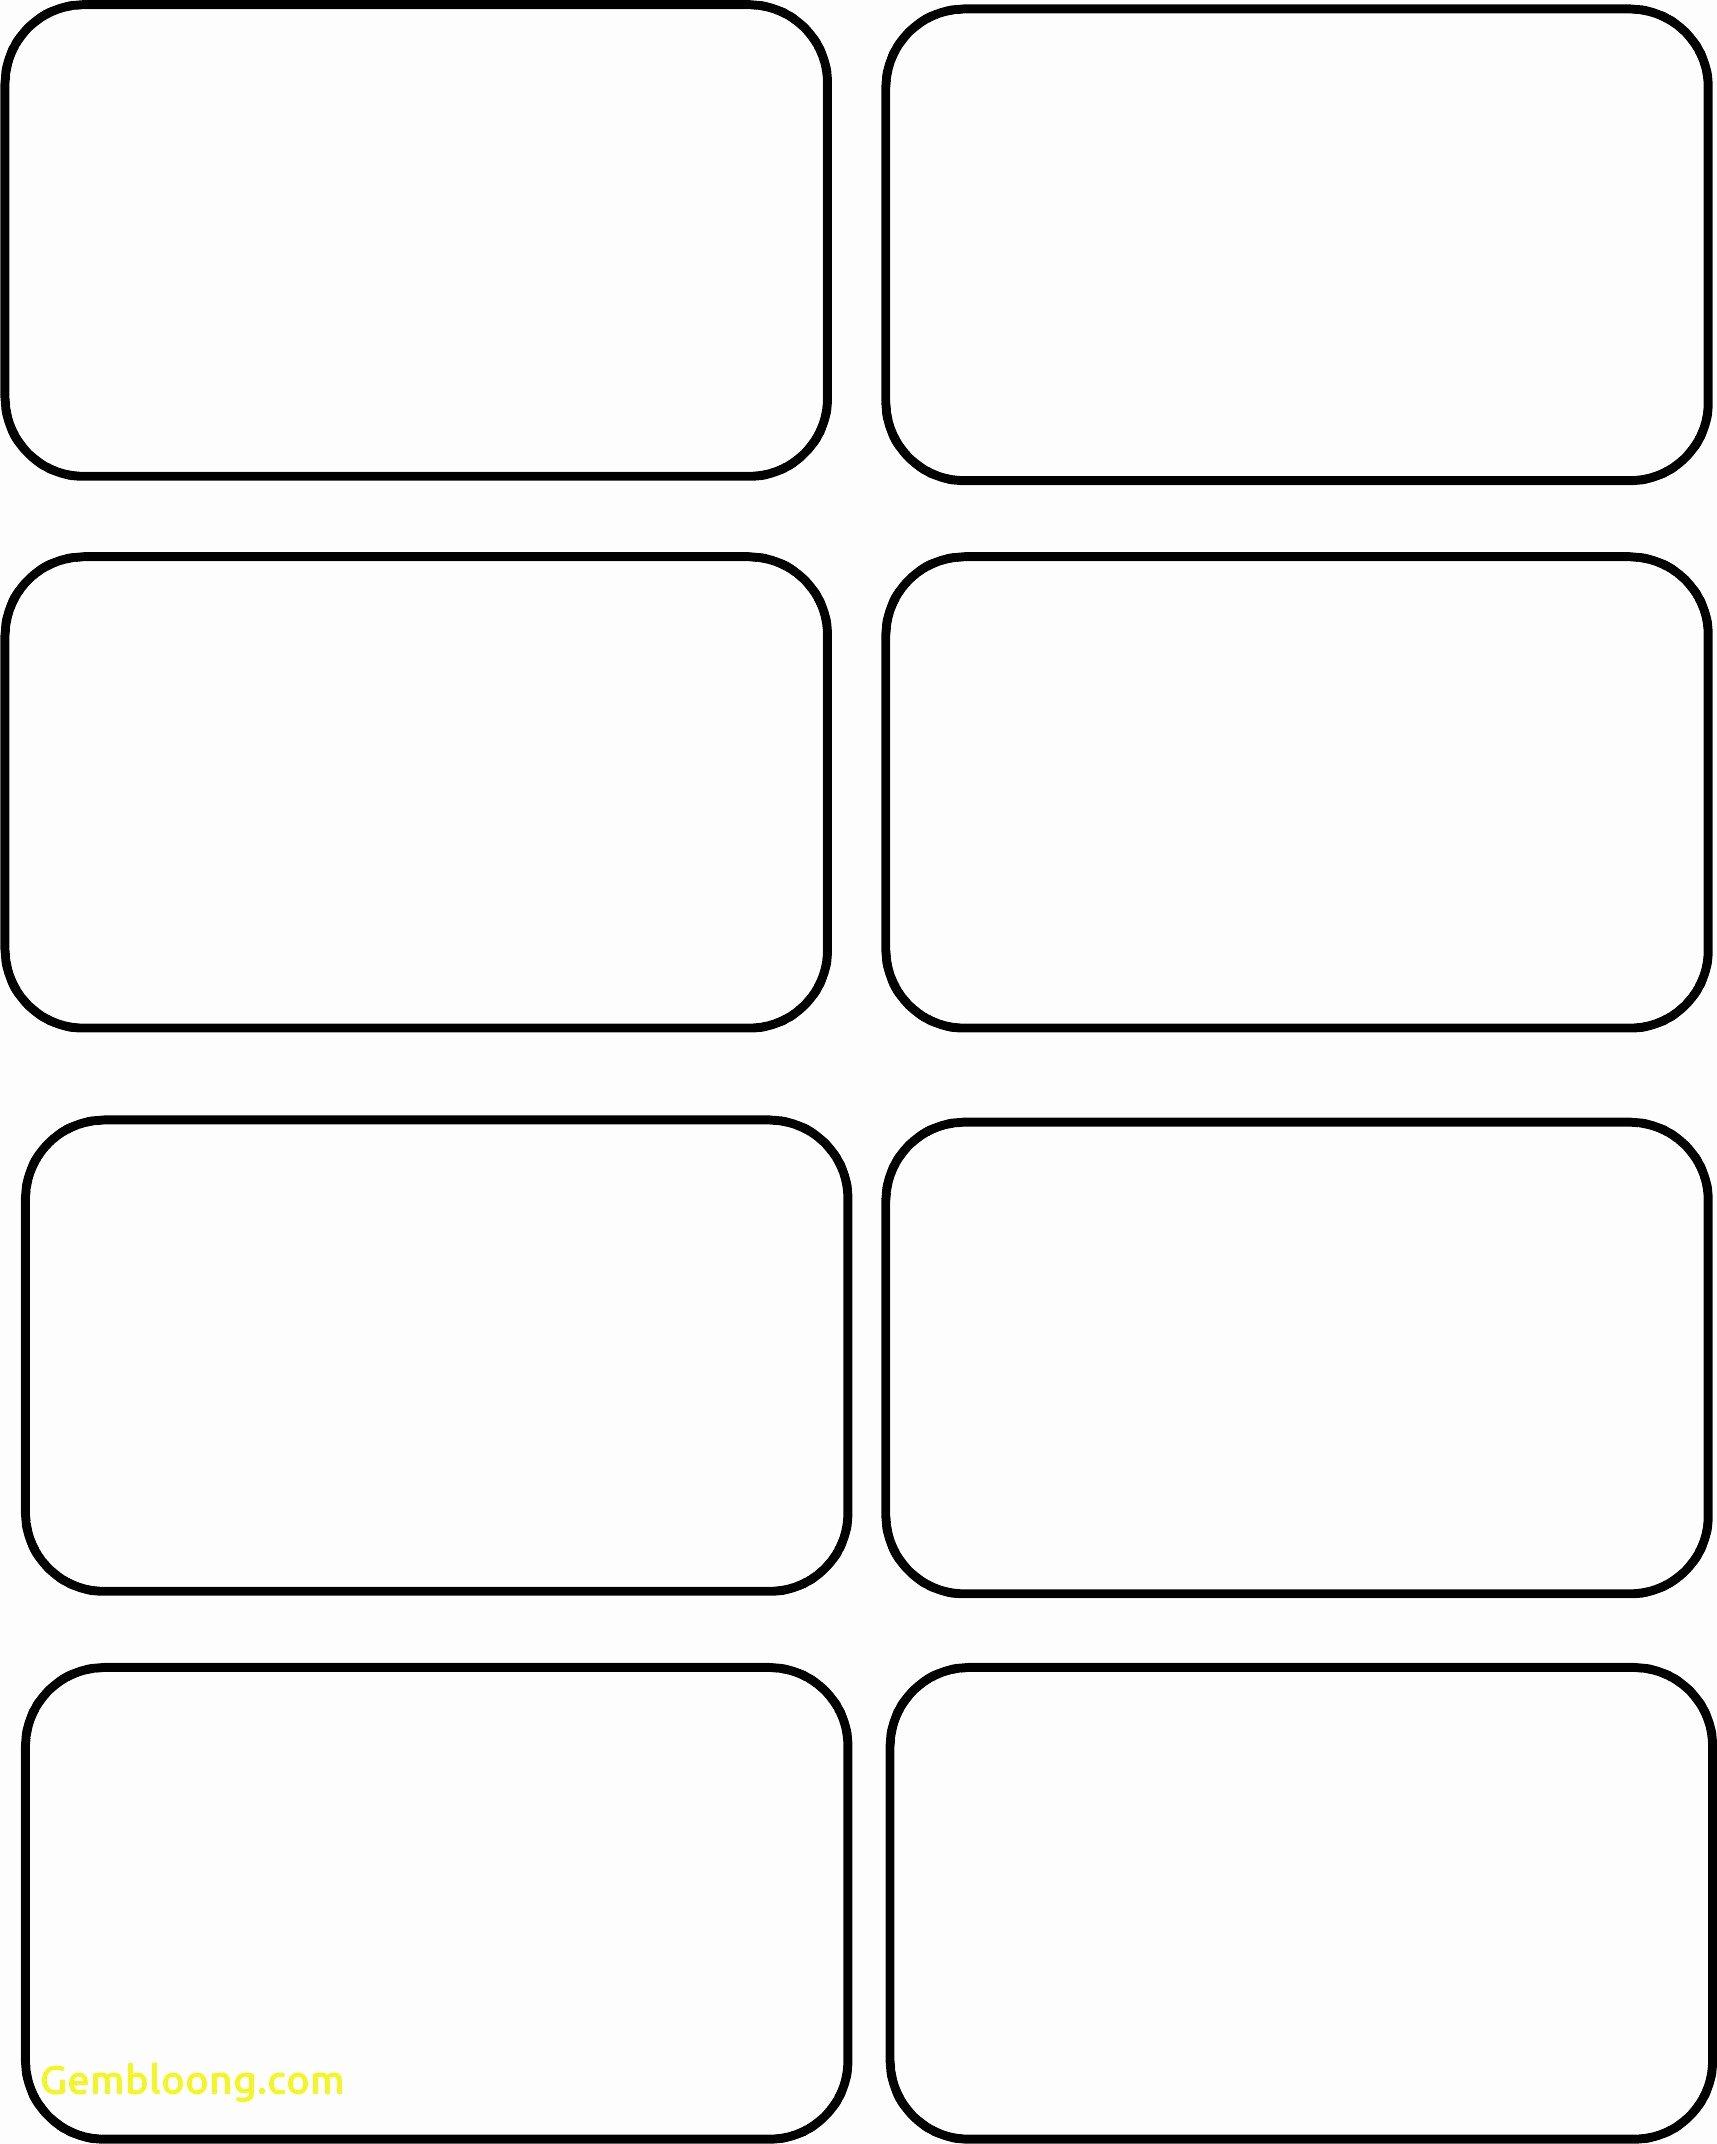 Name Badge Template Free Inspirational Free Printable Name Tags Template